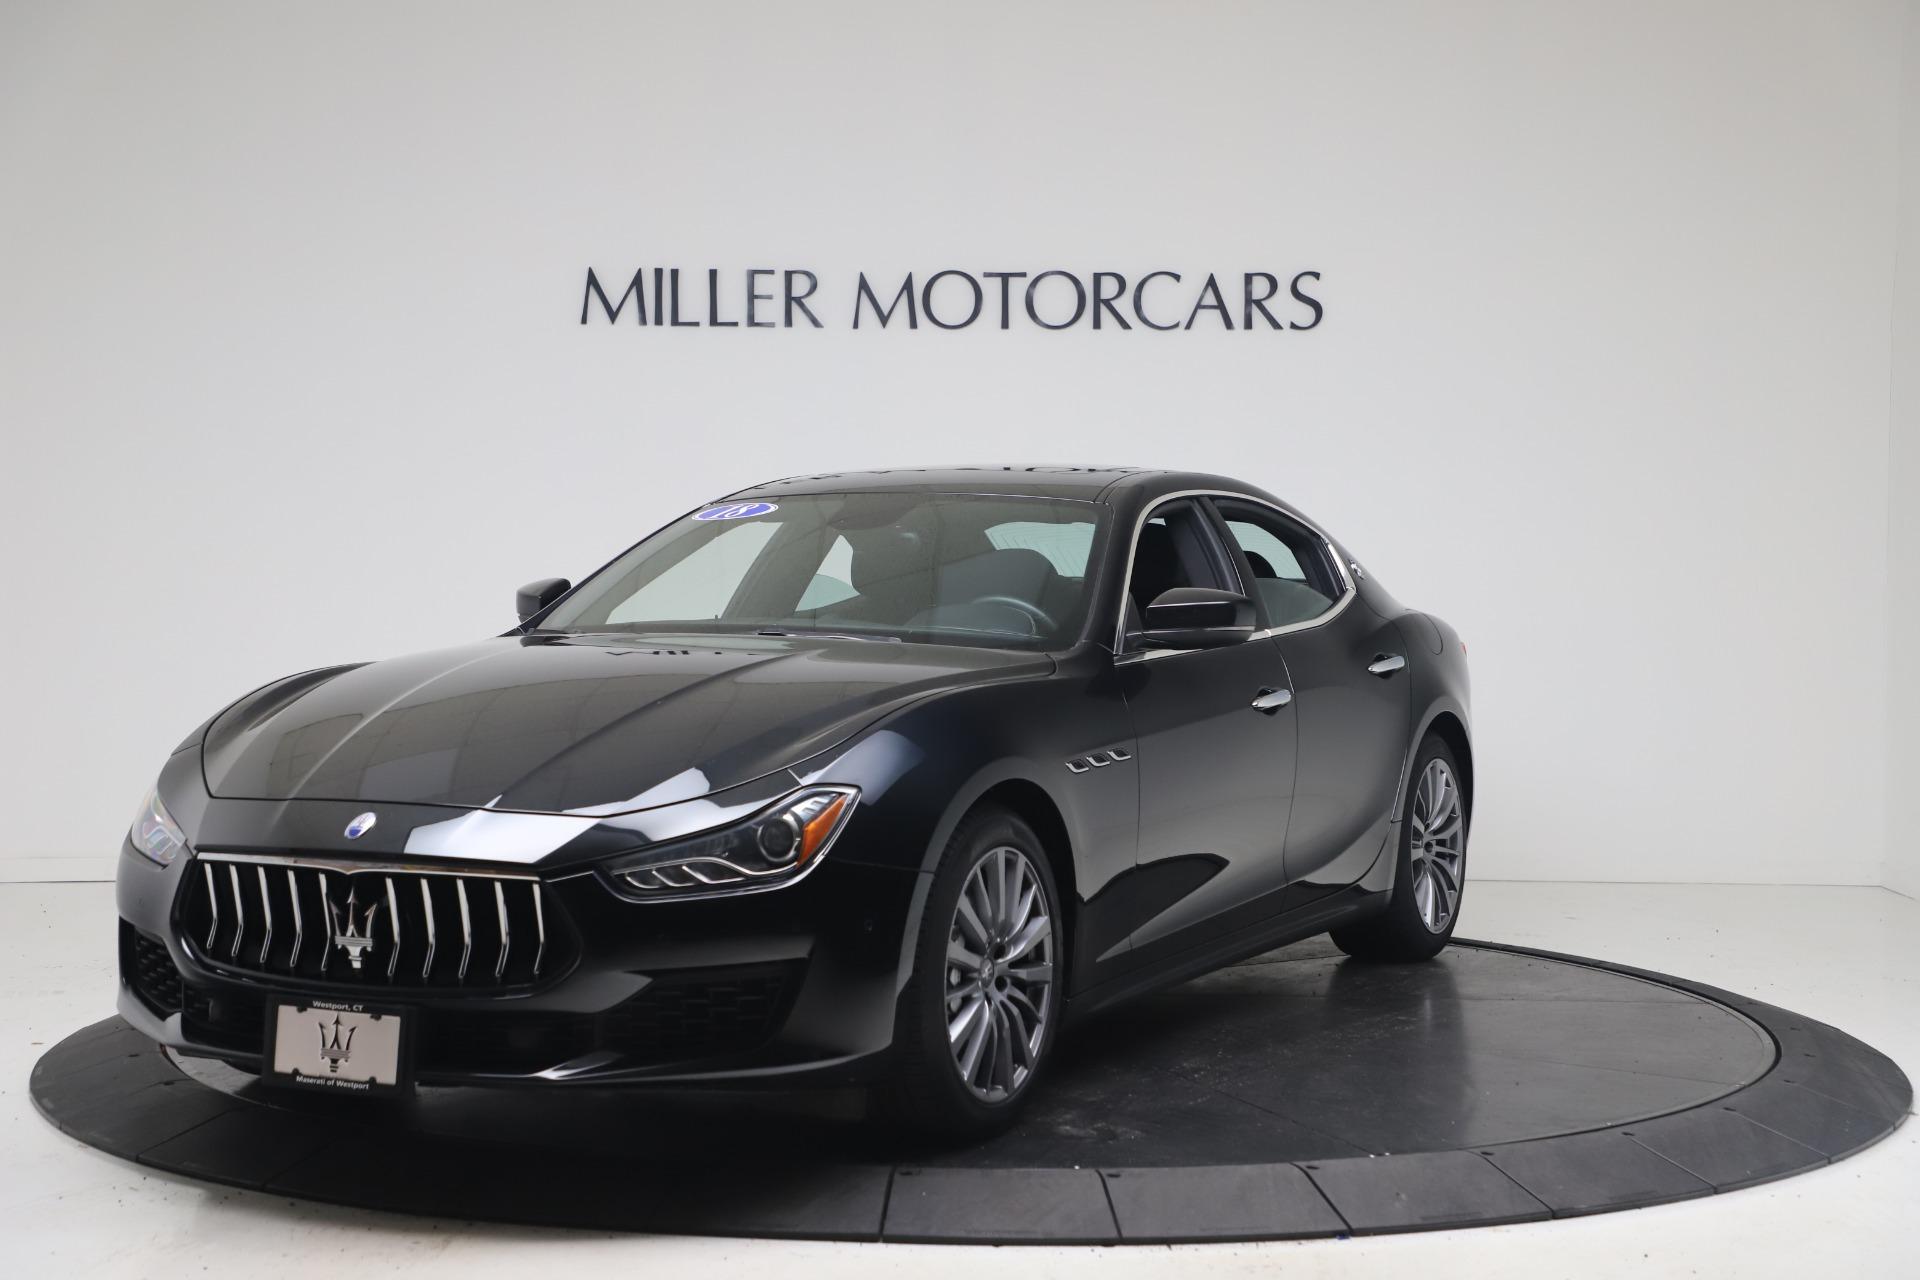 Used 2018 Maserati Ghibli SQ4 for sale $54,900 at Aston Martin of Greenwich in Greenwich CT 06830 1